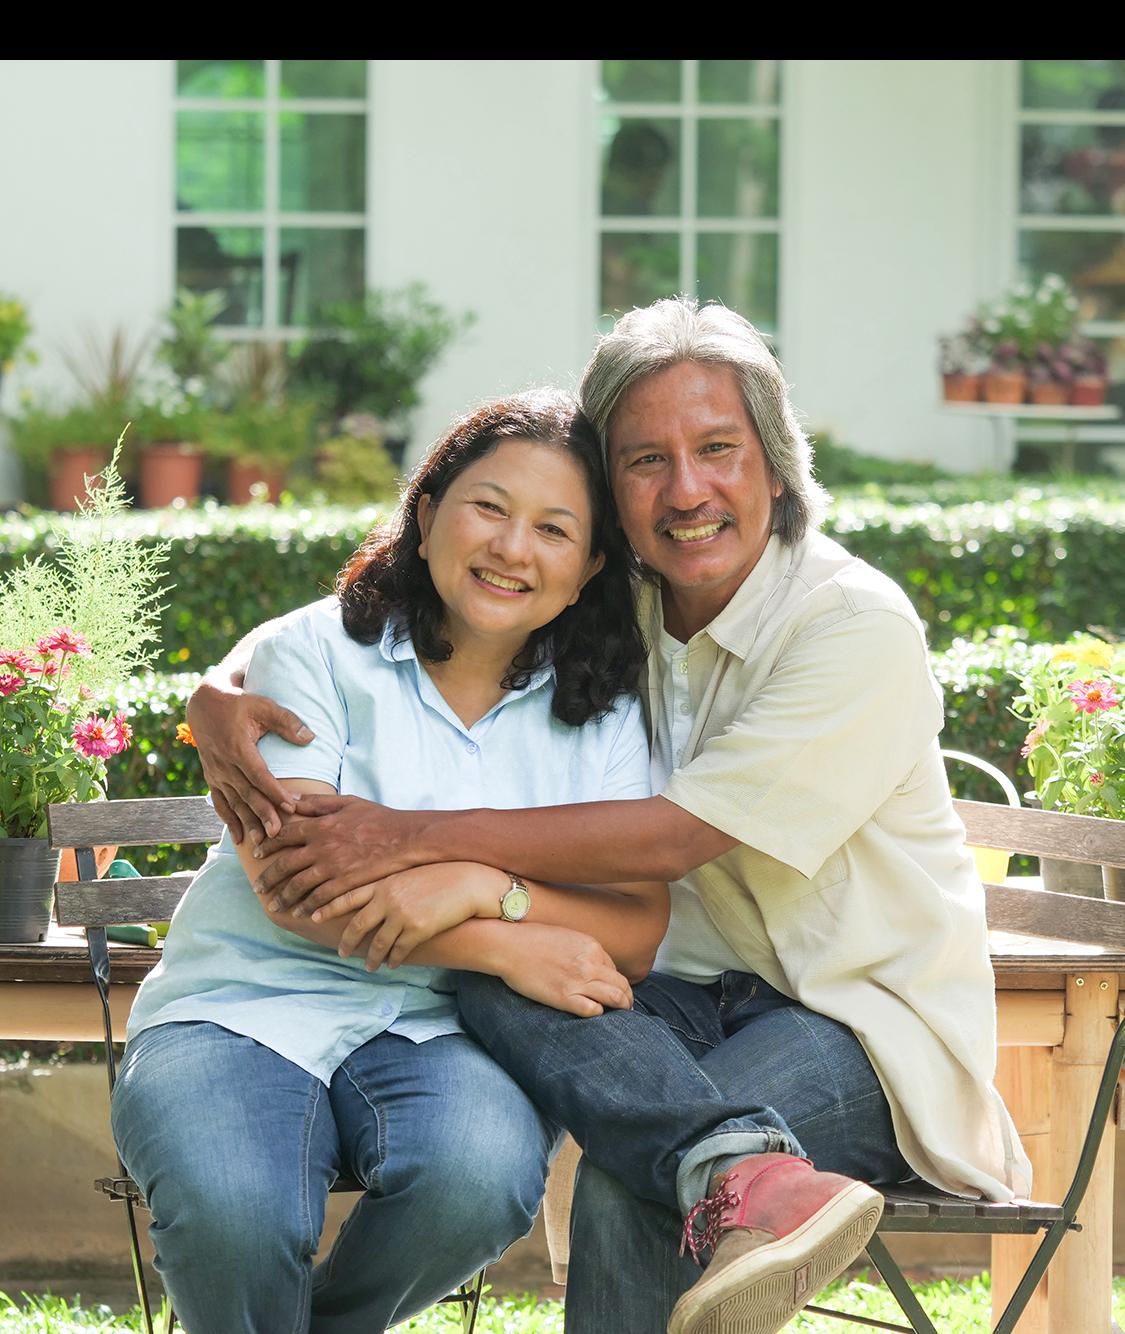 Jumbo Loan | Major Mortgage | couple On Bench